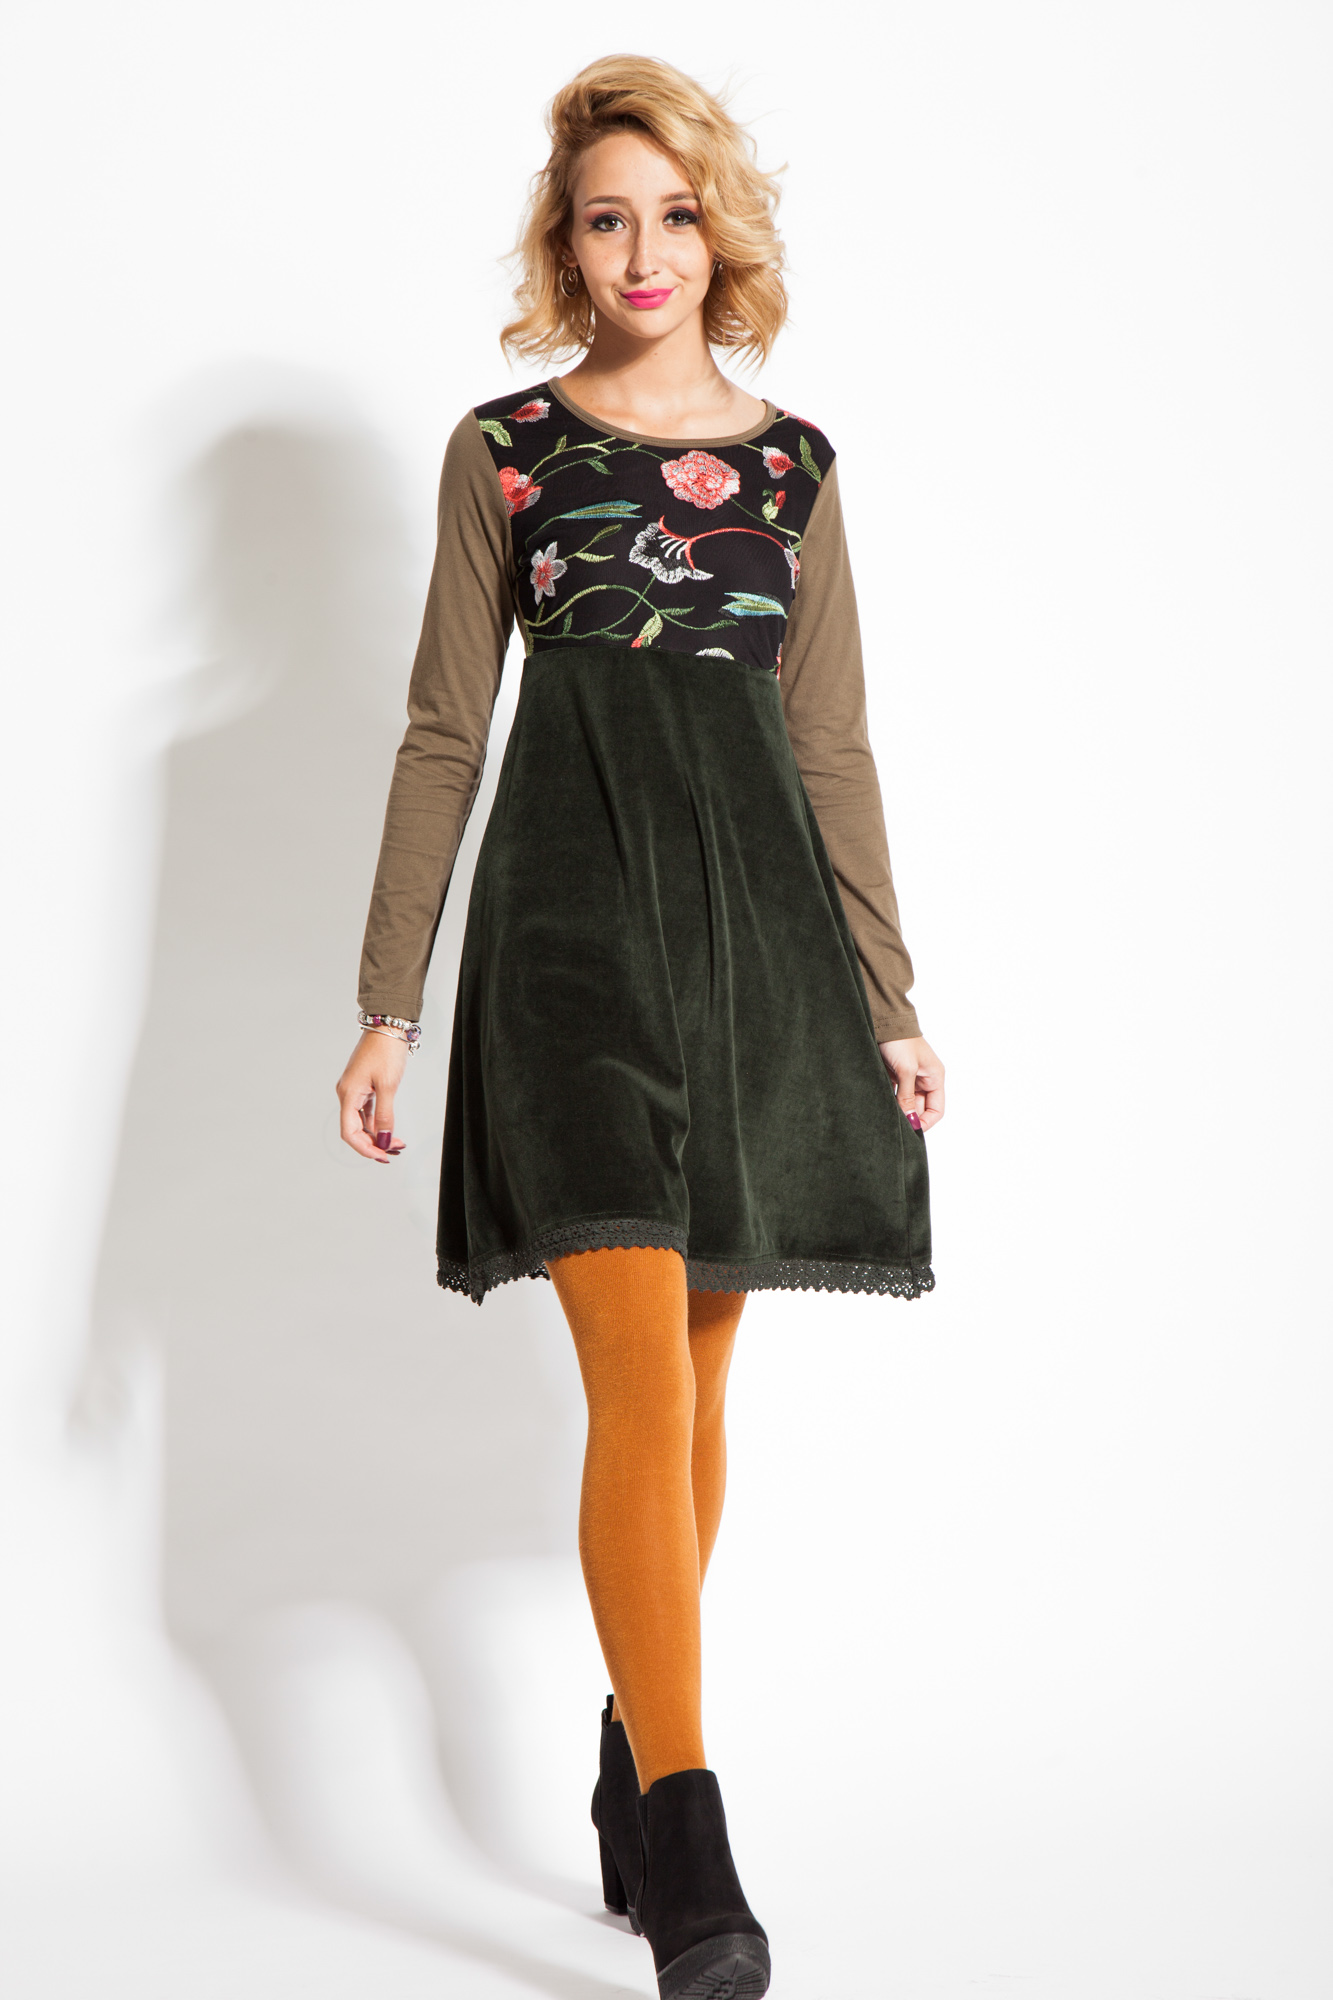 Rochie de catifea verde inchis cu broderie florala